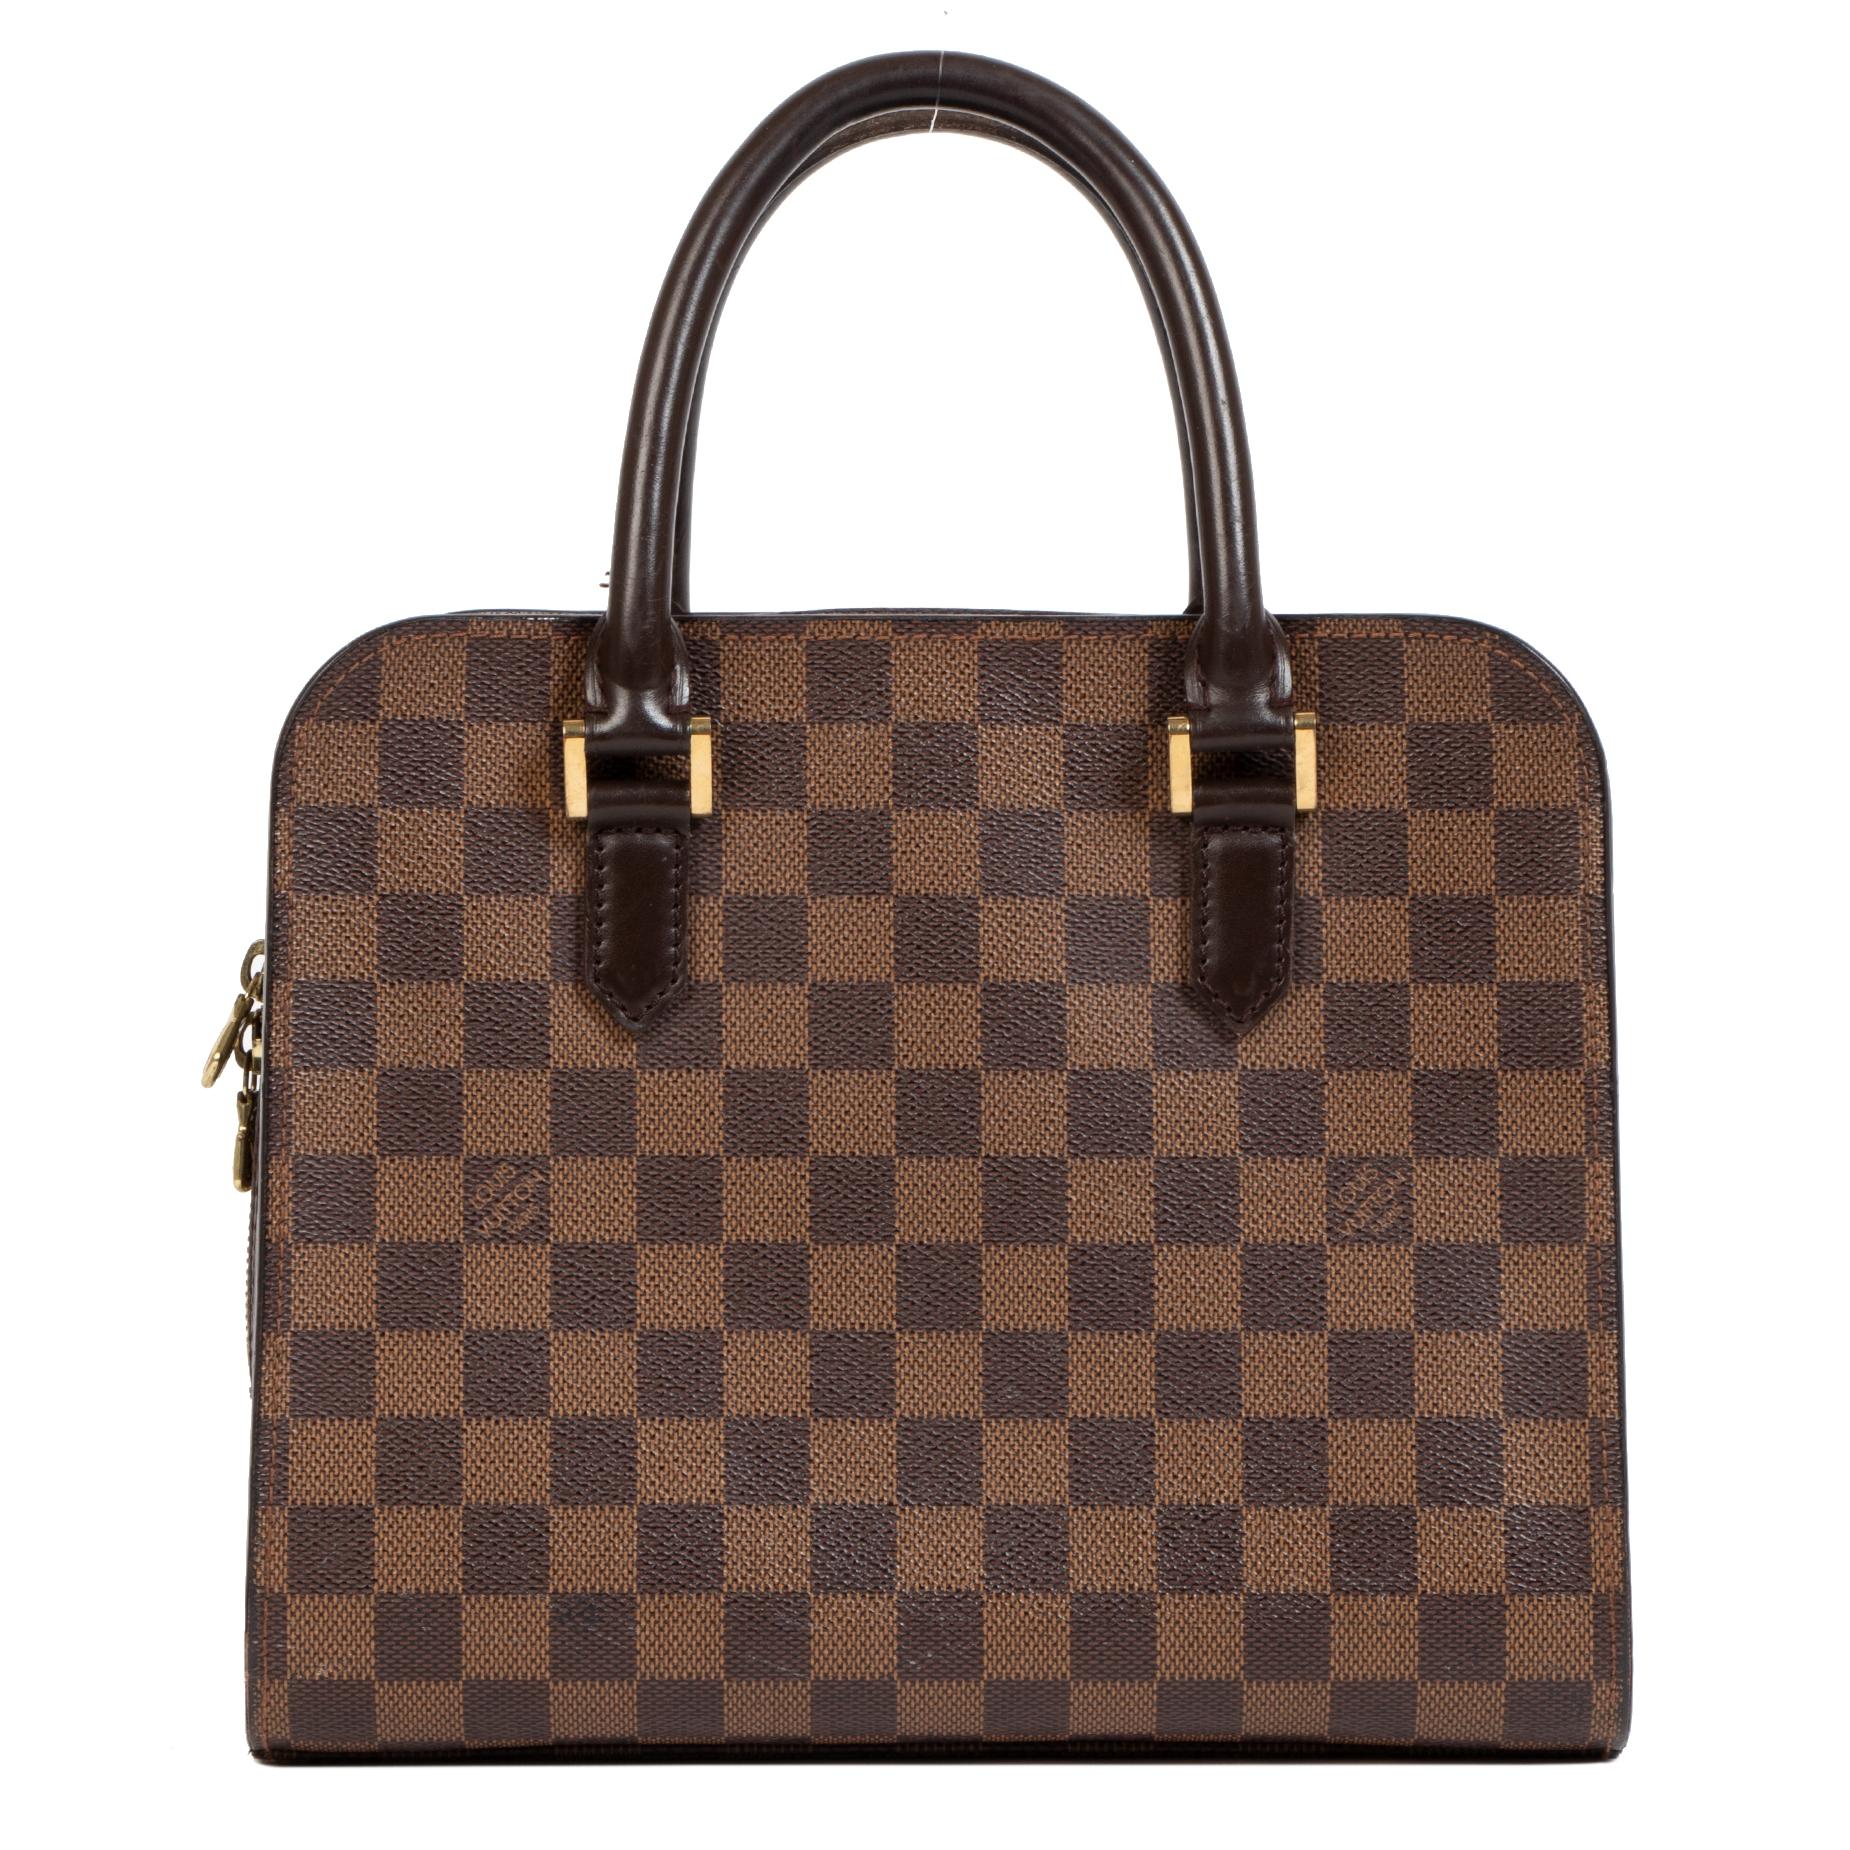 Authentic secondhand Louis Vuitton Damier Ebene Triana Bag designer bags designer brands luxury vintage webshop safe secure online shopping fashion worldwide shipping